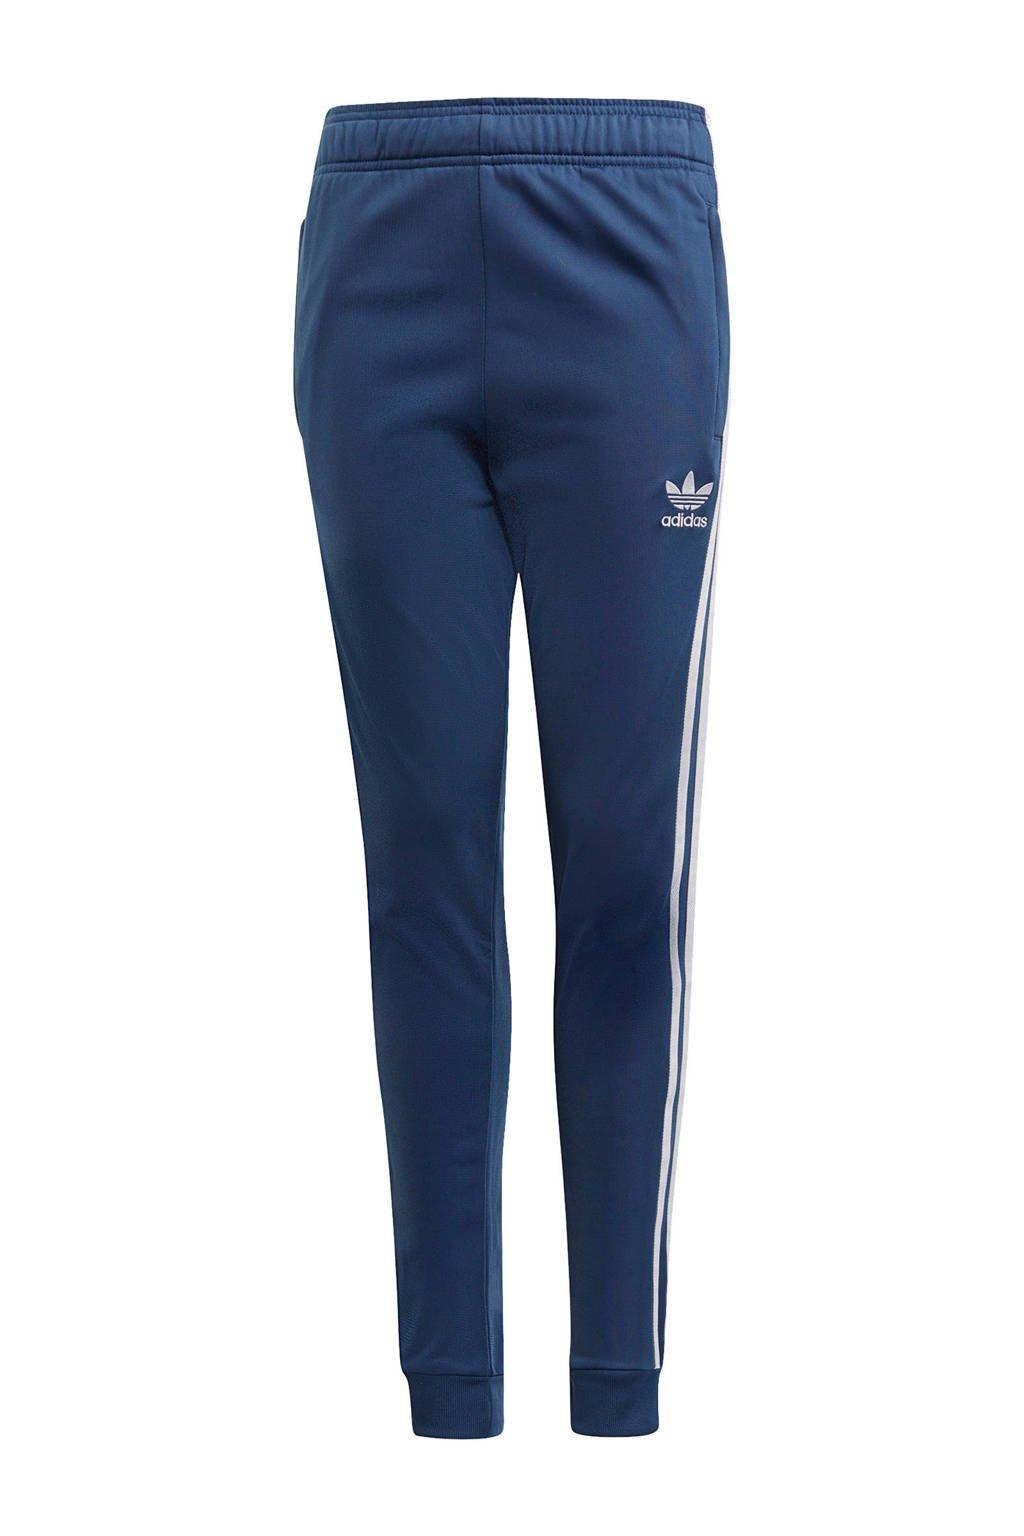 adidas Originals trainingsbroek donkerblauw/wit, Donkerblauw/wit